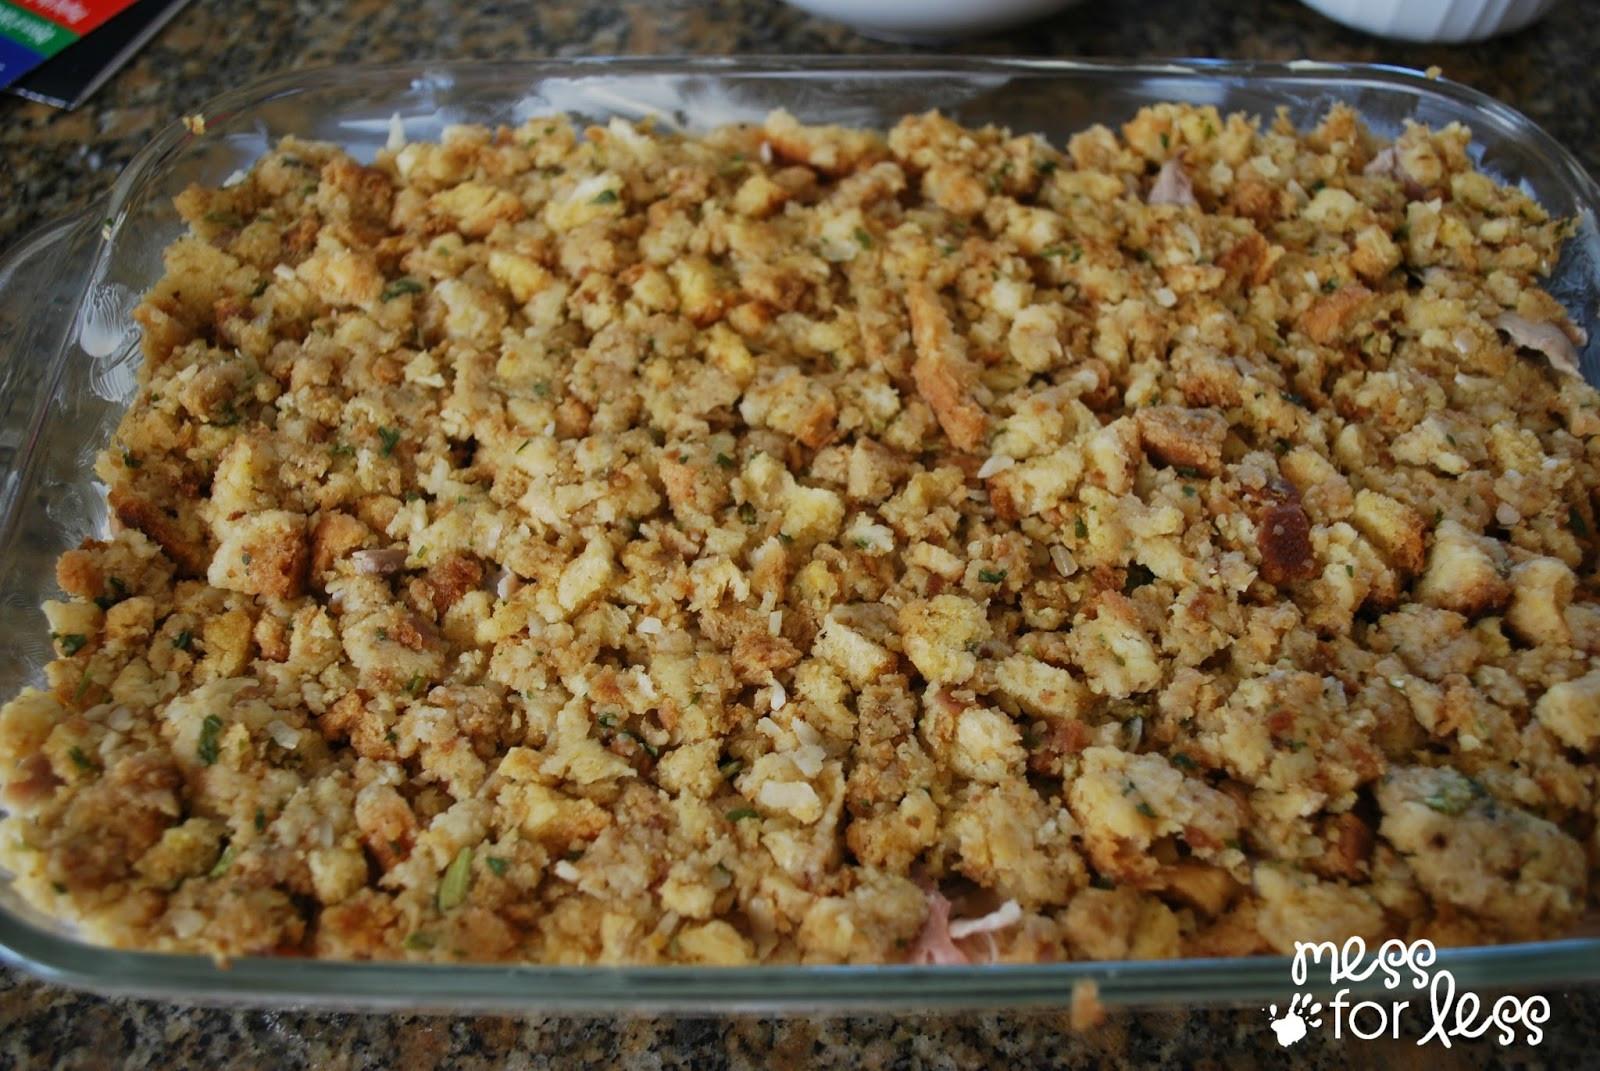 Bake Thanksgiving Turkey  Thanksgiving Dinner Casserole Mess for Less